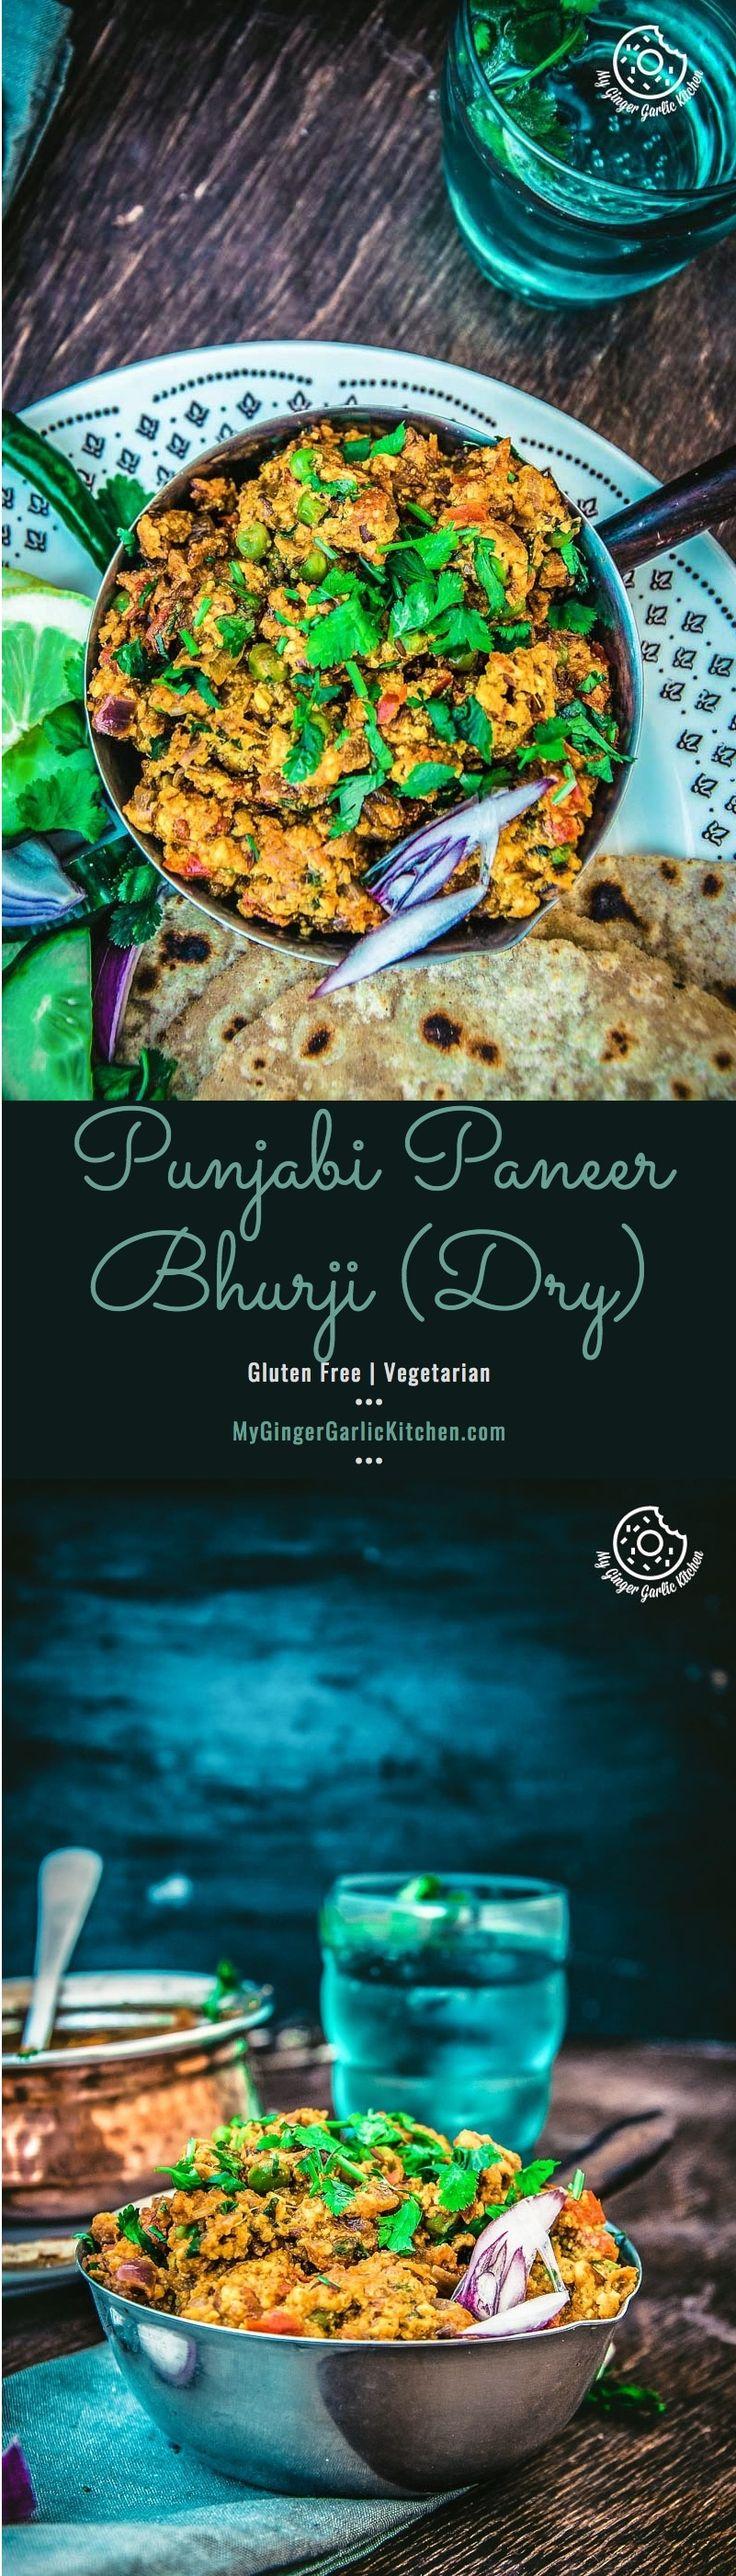 Wie macht man Paneer Bhurji |  Punjabi Paneer Bhurji Trockenes Rezept |  Rührei  Mygingergarlickitchen.com/ @anupama_dreams